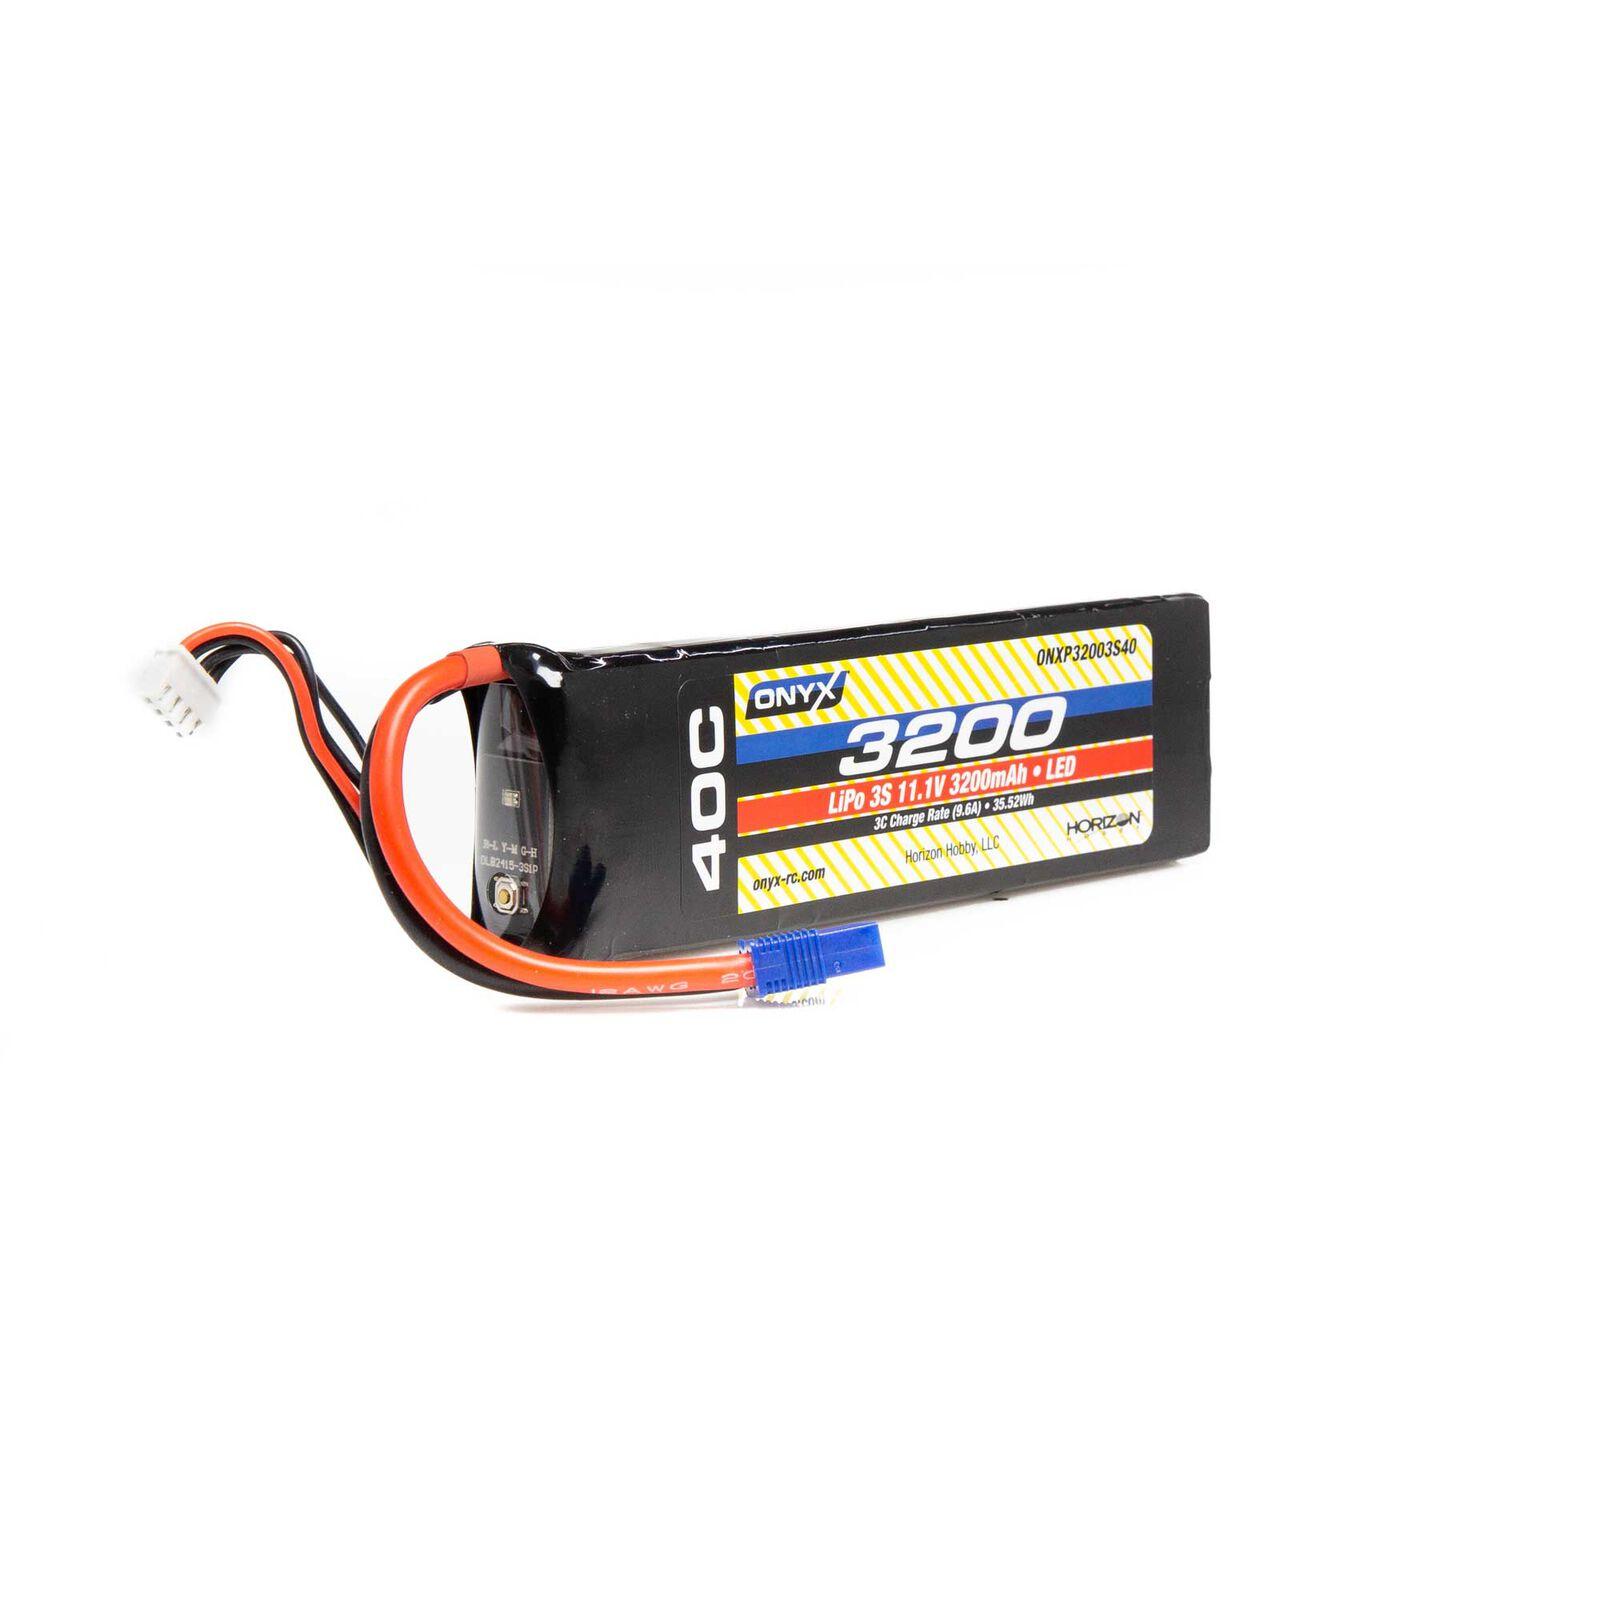 11.1V 3200mAh 3S 40C LiPo Battery: EC3